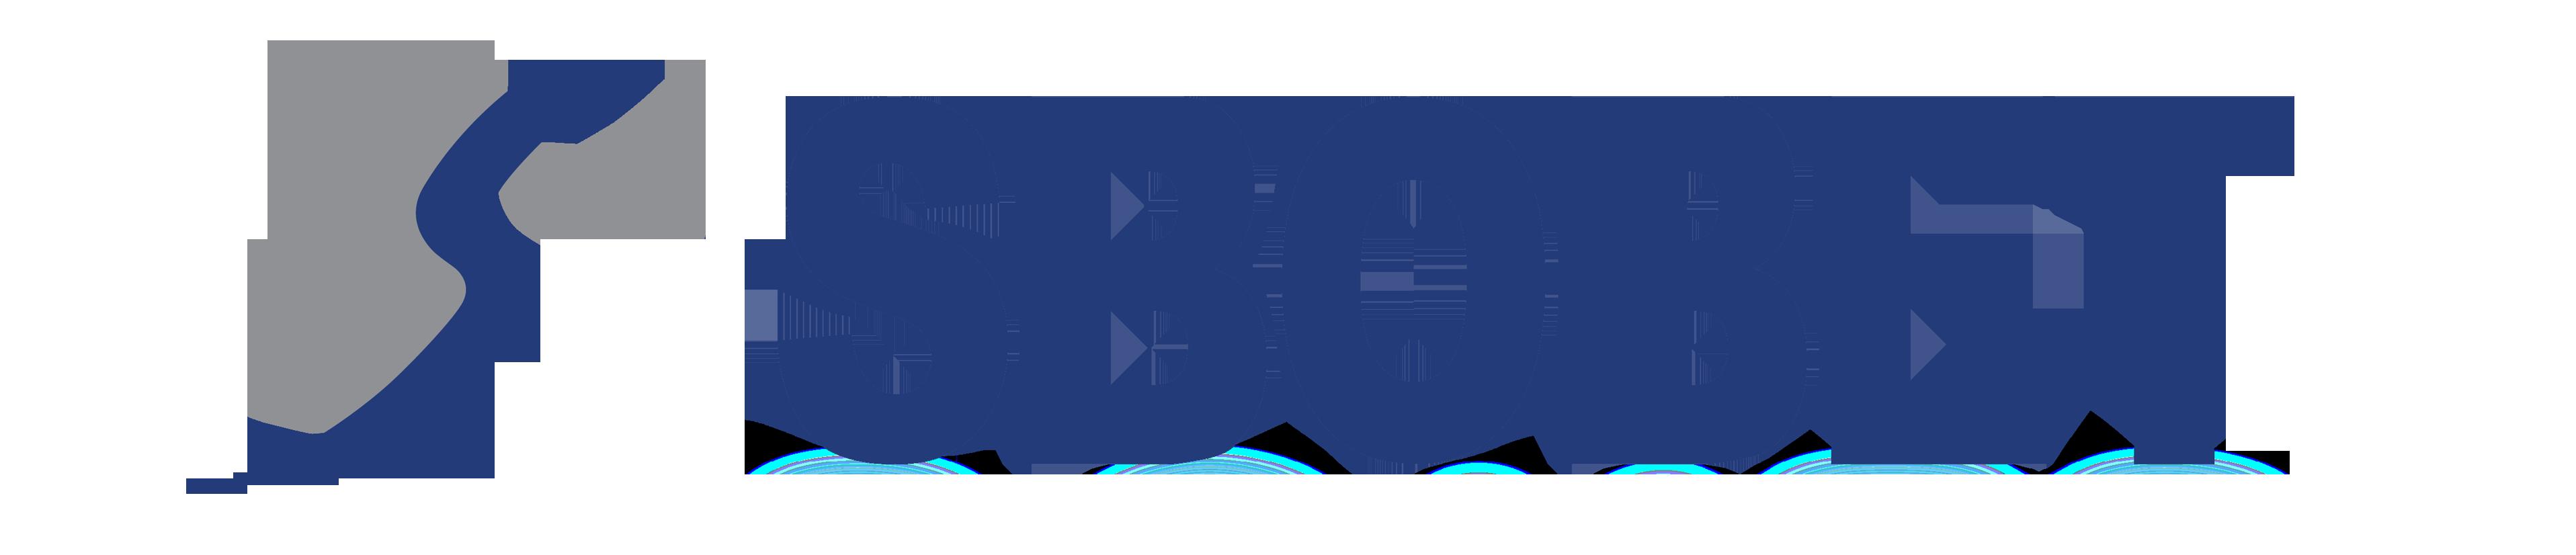 Sbobet-logo new